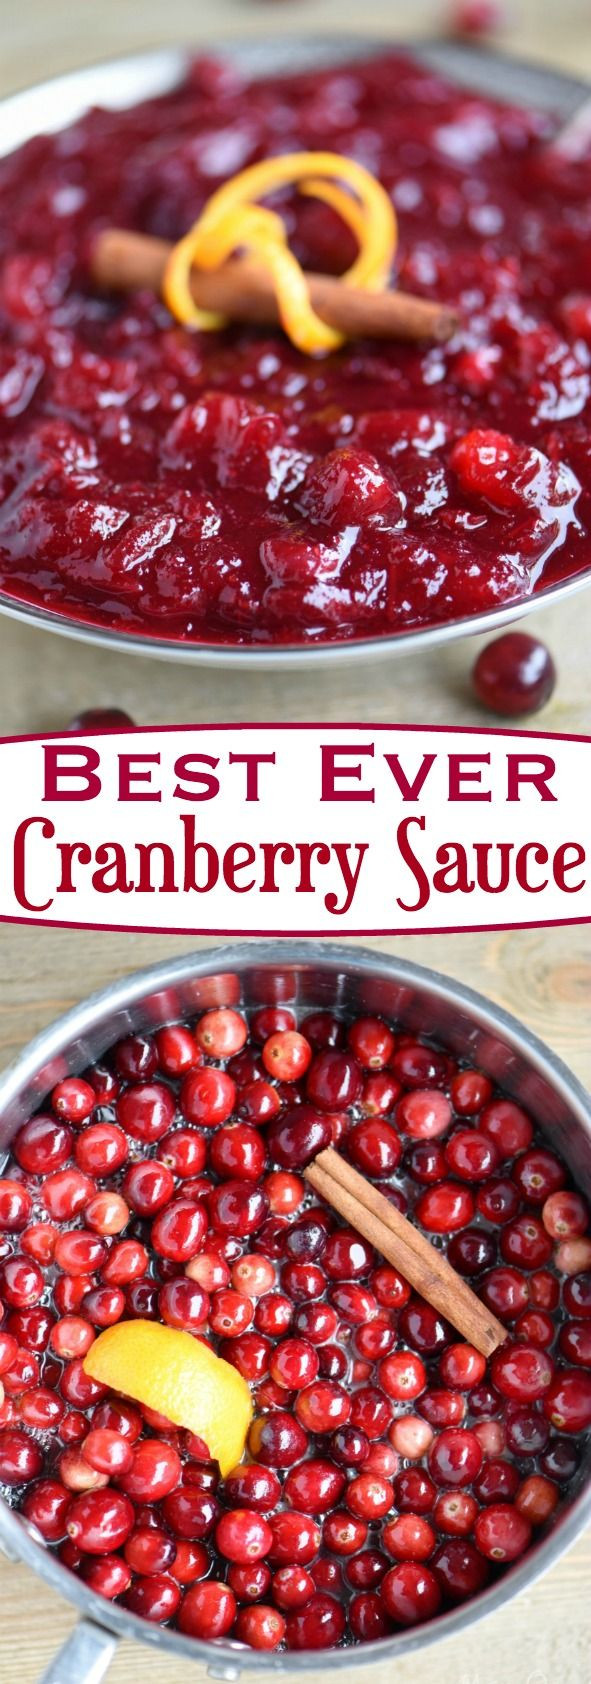 Best Cranberry Recipes Thanksgiving  Best 25 Orange juice ideas on Pinterest